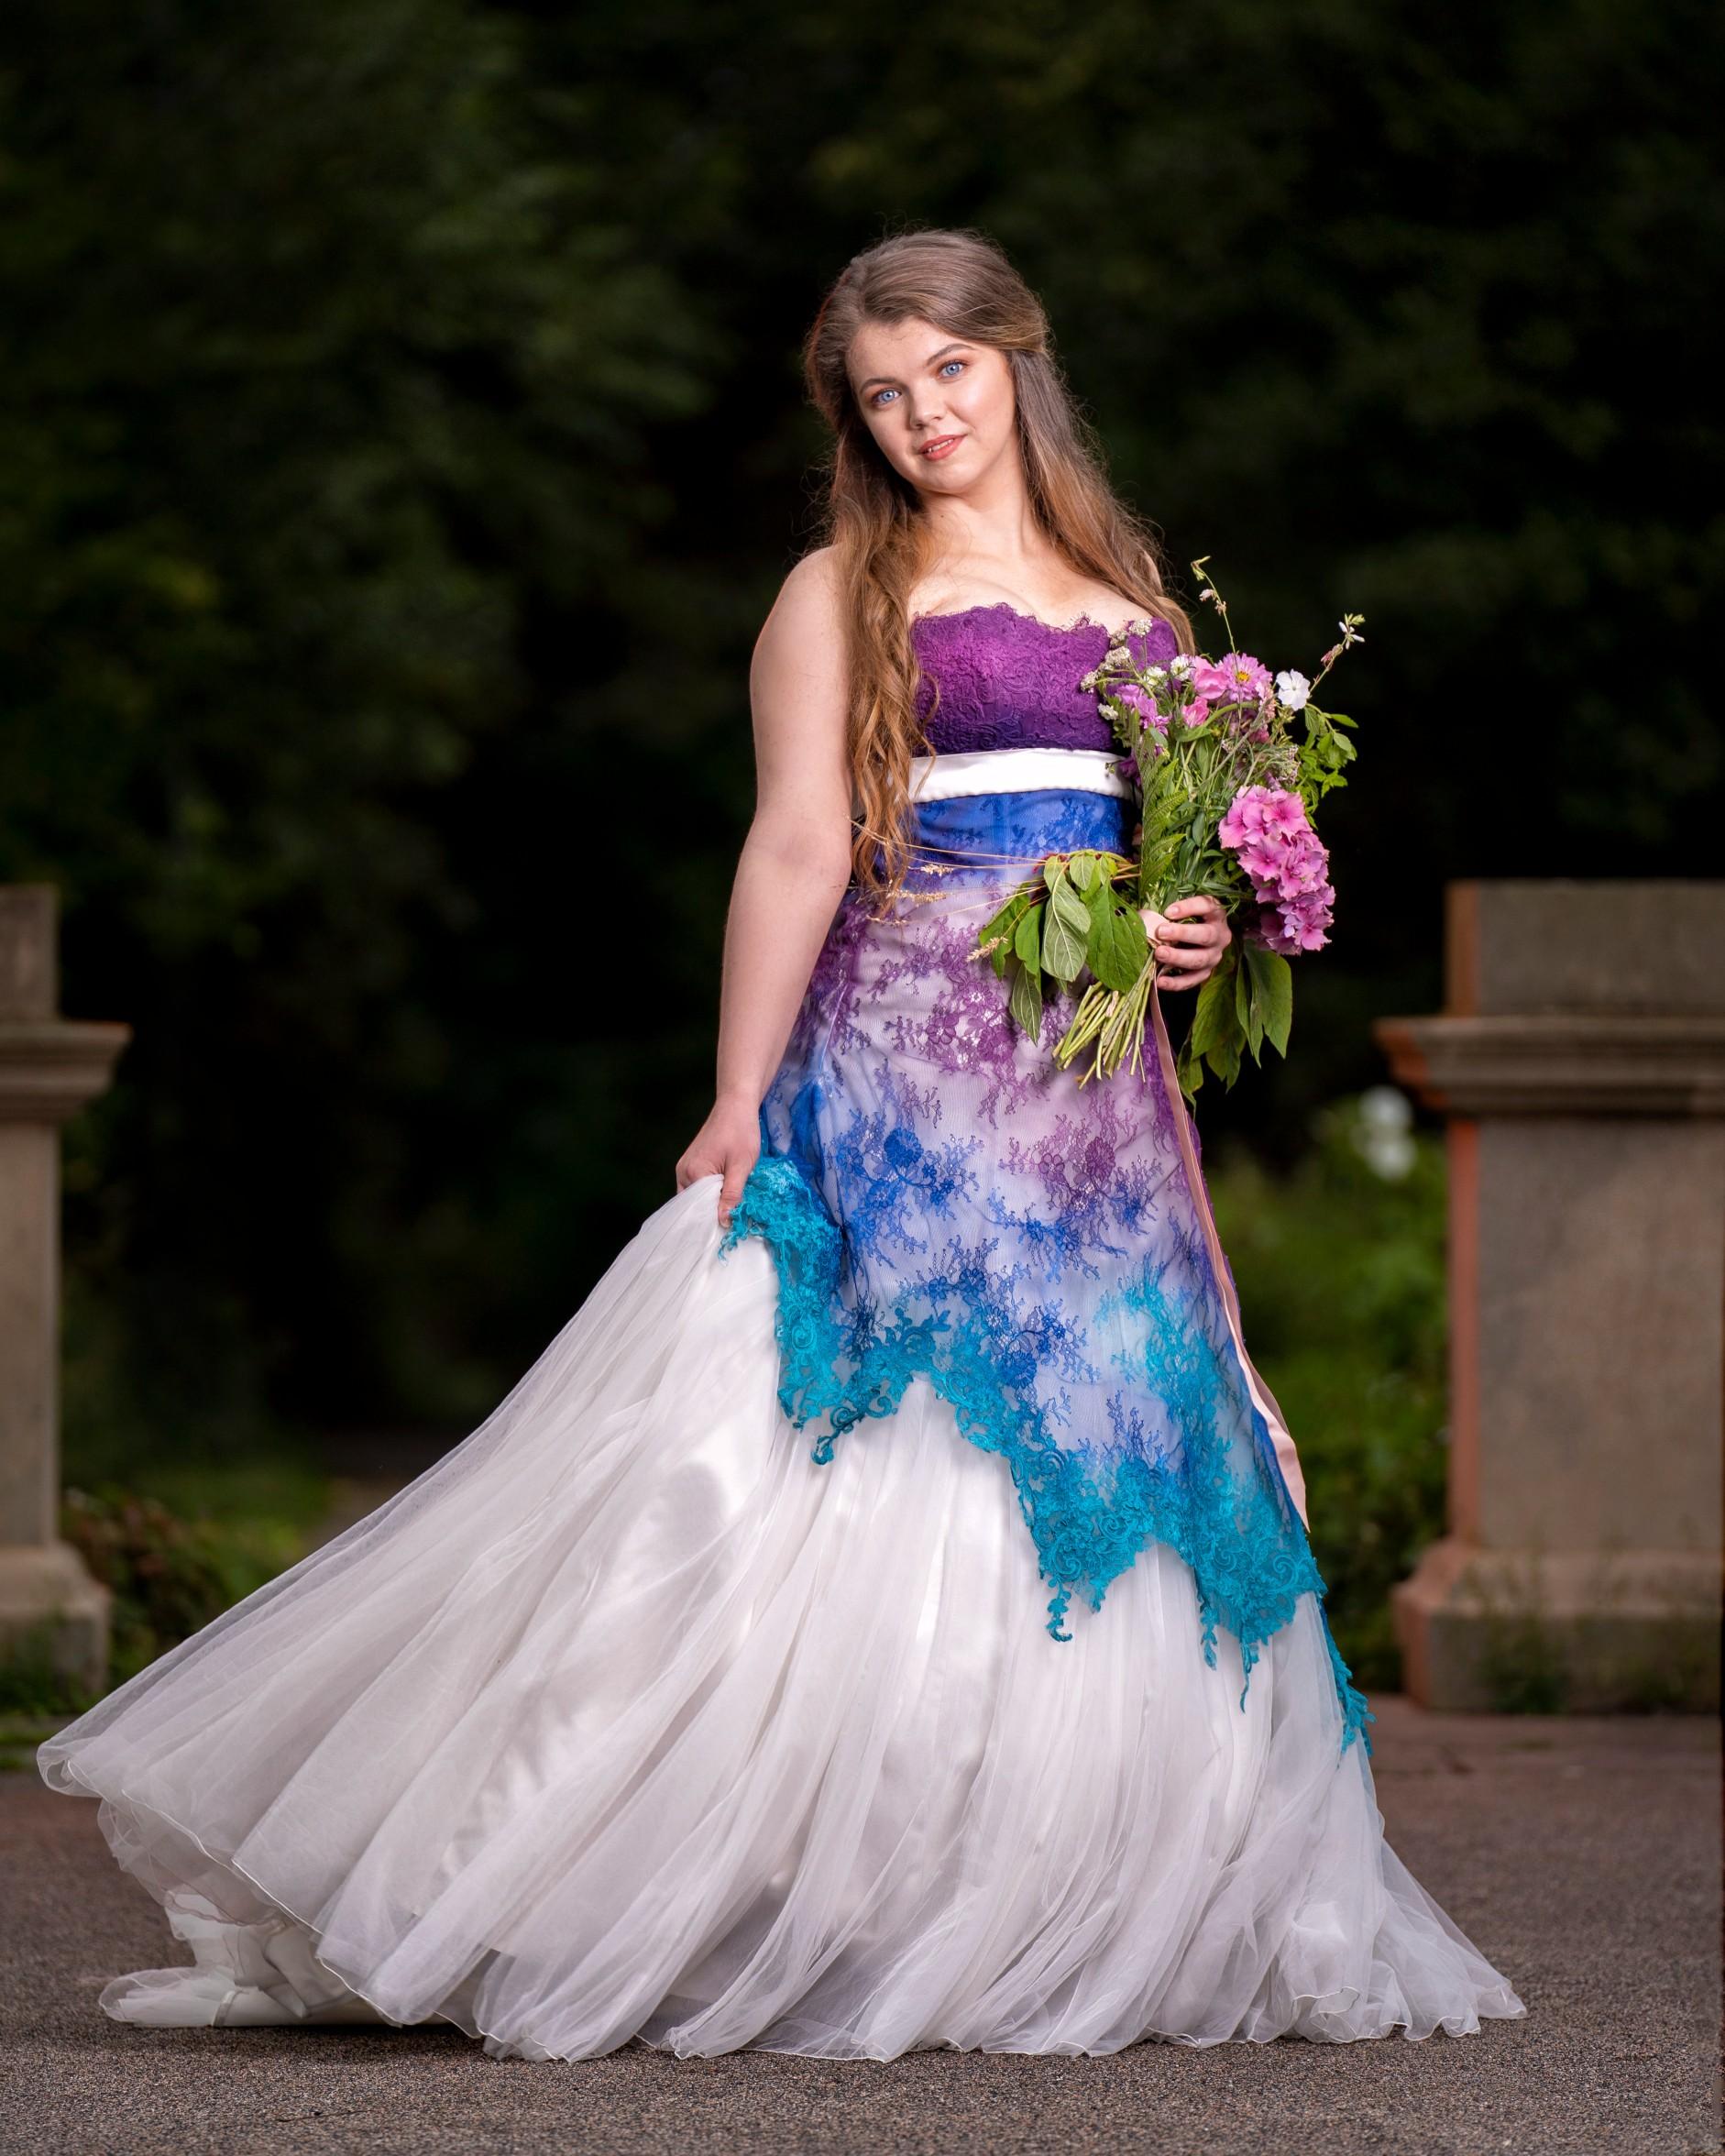 Corsetry and Couture - alternative bridal wear - unique wedding dresses - bespoke wedding dress uk - coloured wedding dress